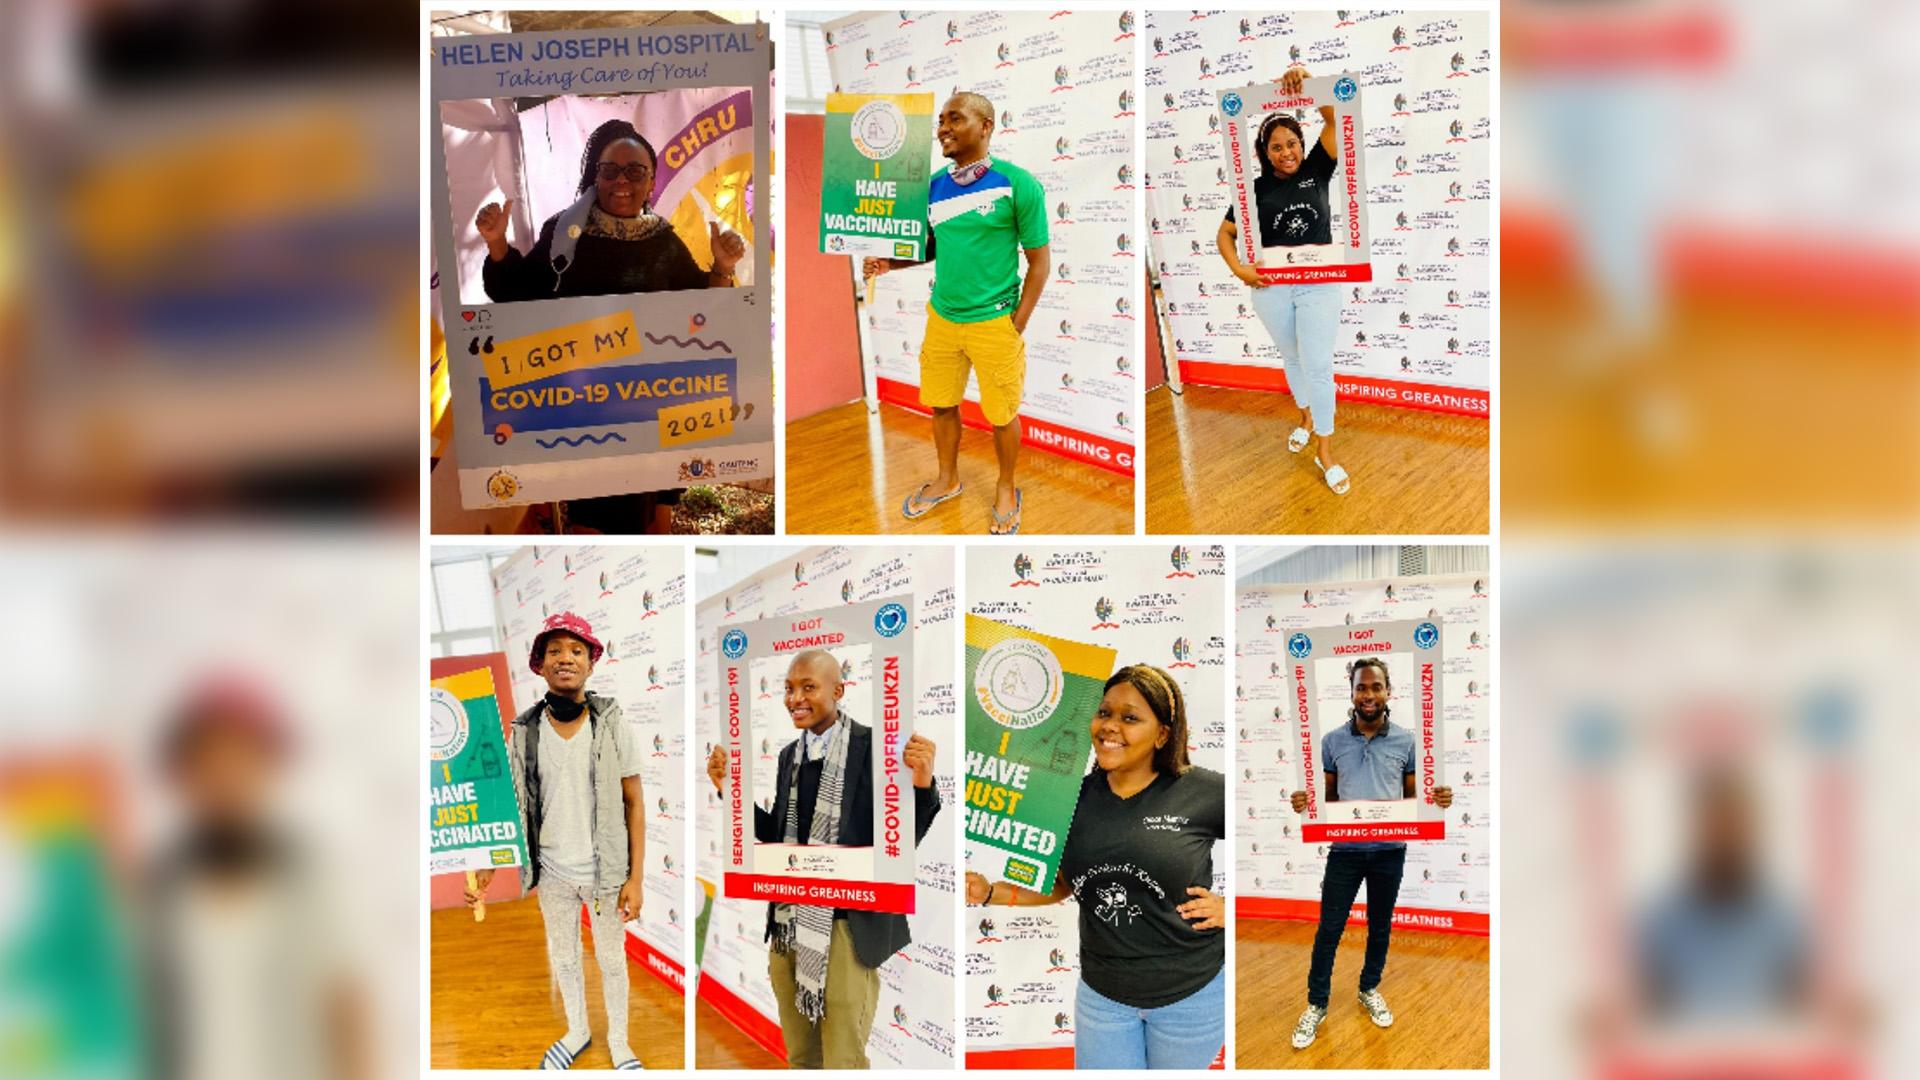 Clockwise from top left: Mrs Sisana Machi, Mr Teboho Hlao, Ms Malerato Jafta, Mr Johnson Mthembu, Ms Precious Khawula, Mr Bulelani Chiya, and Mr Lusanda Radebe.